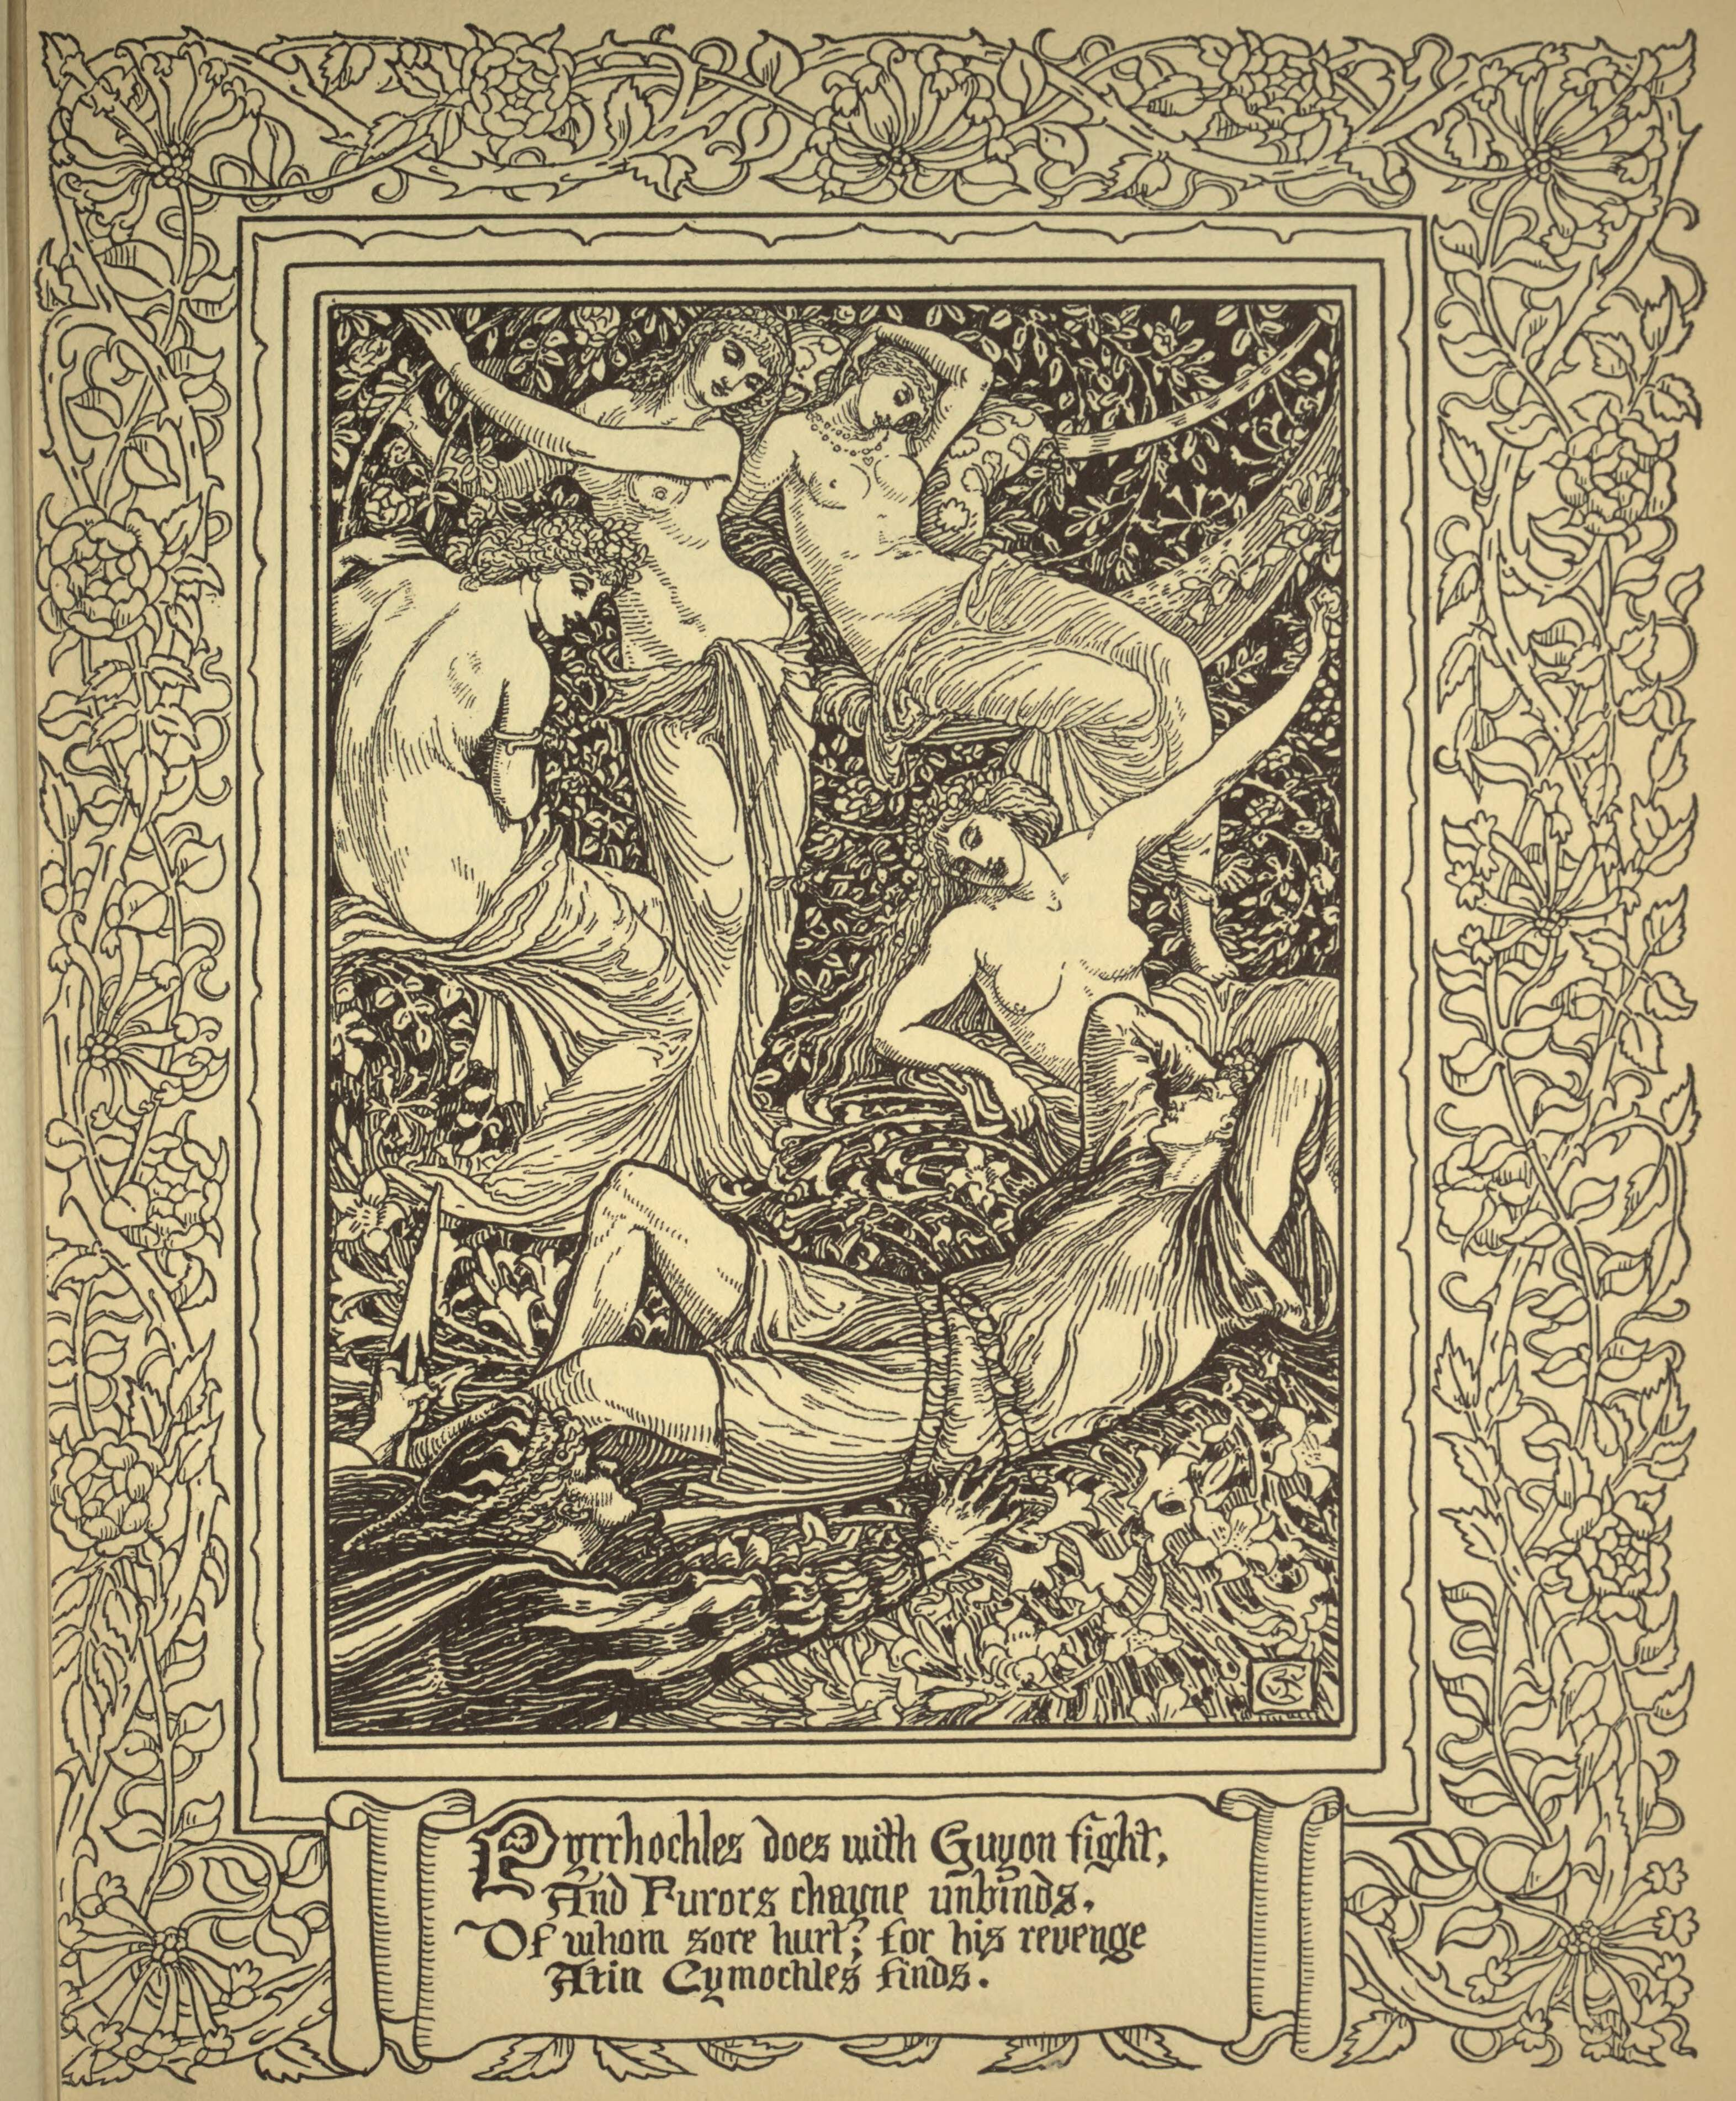 From Spenser's Faerie Queene Vol. 2